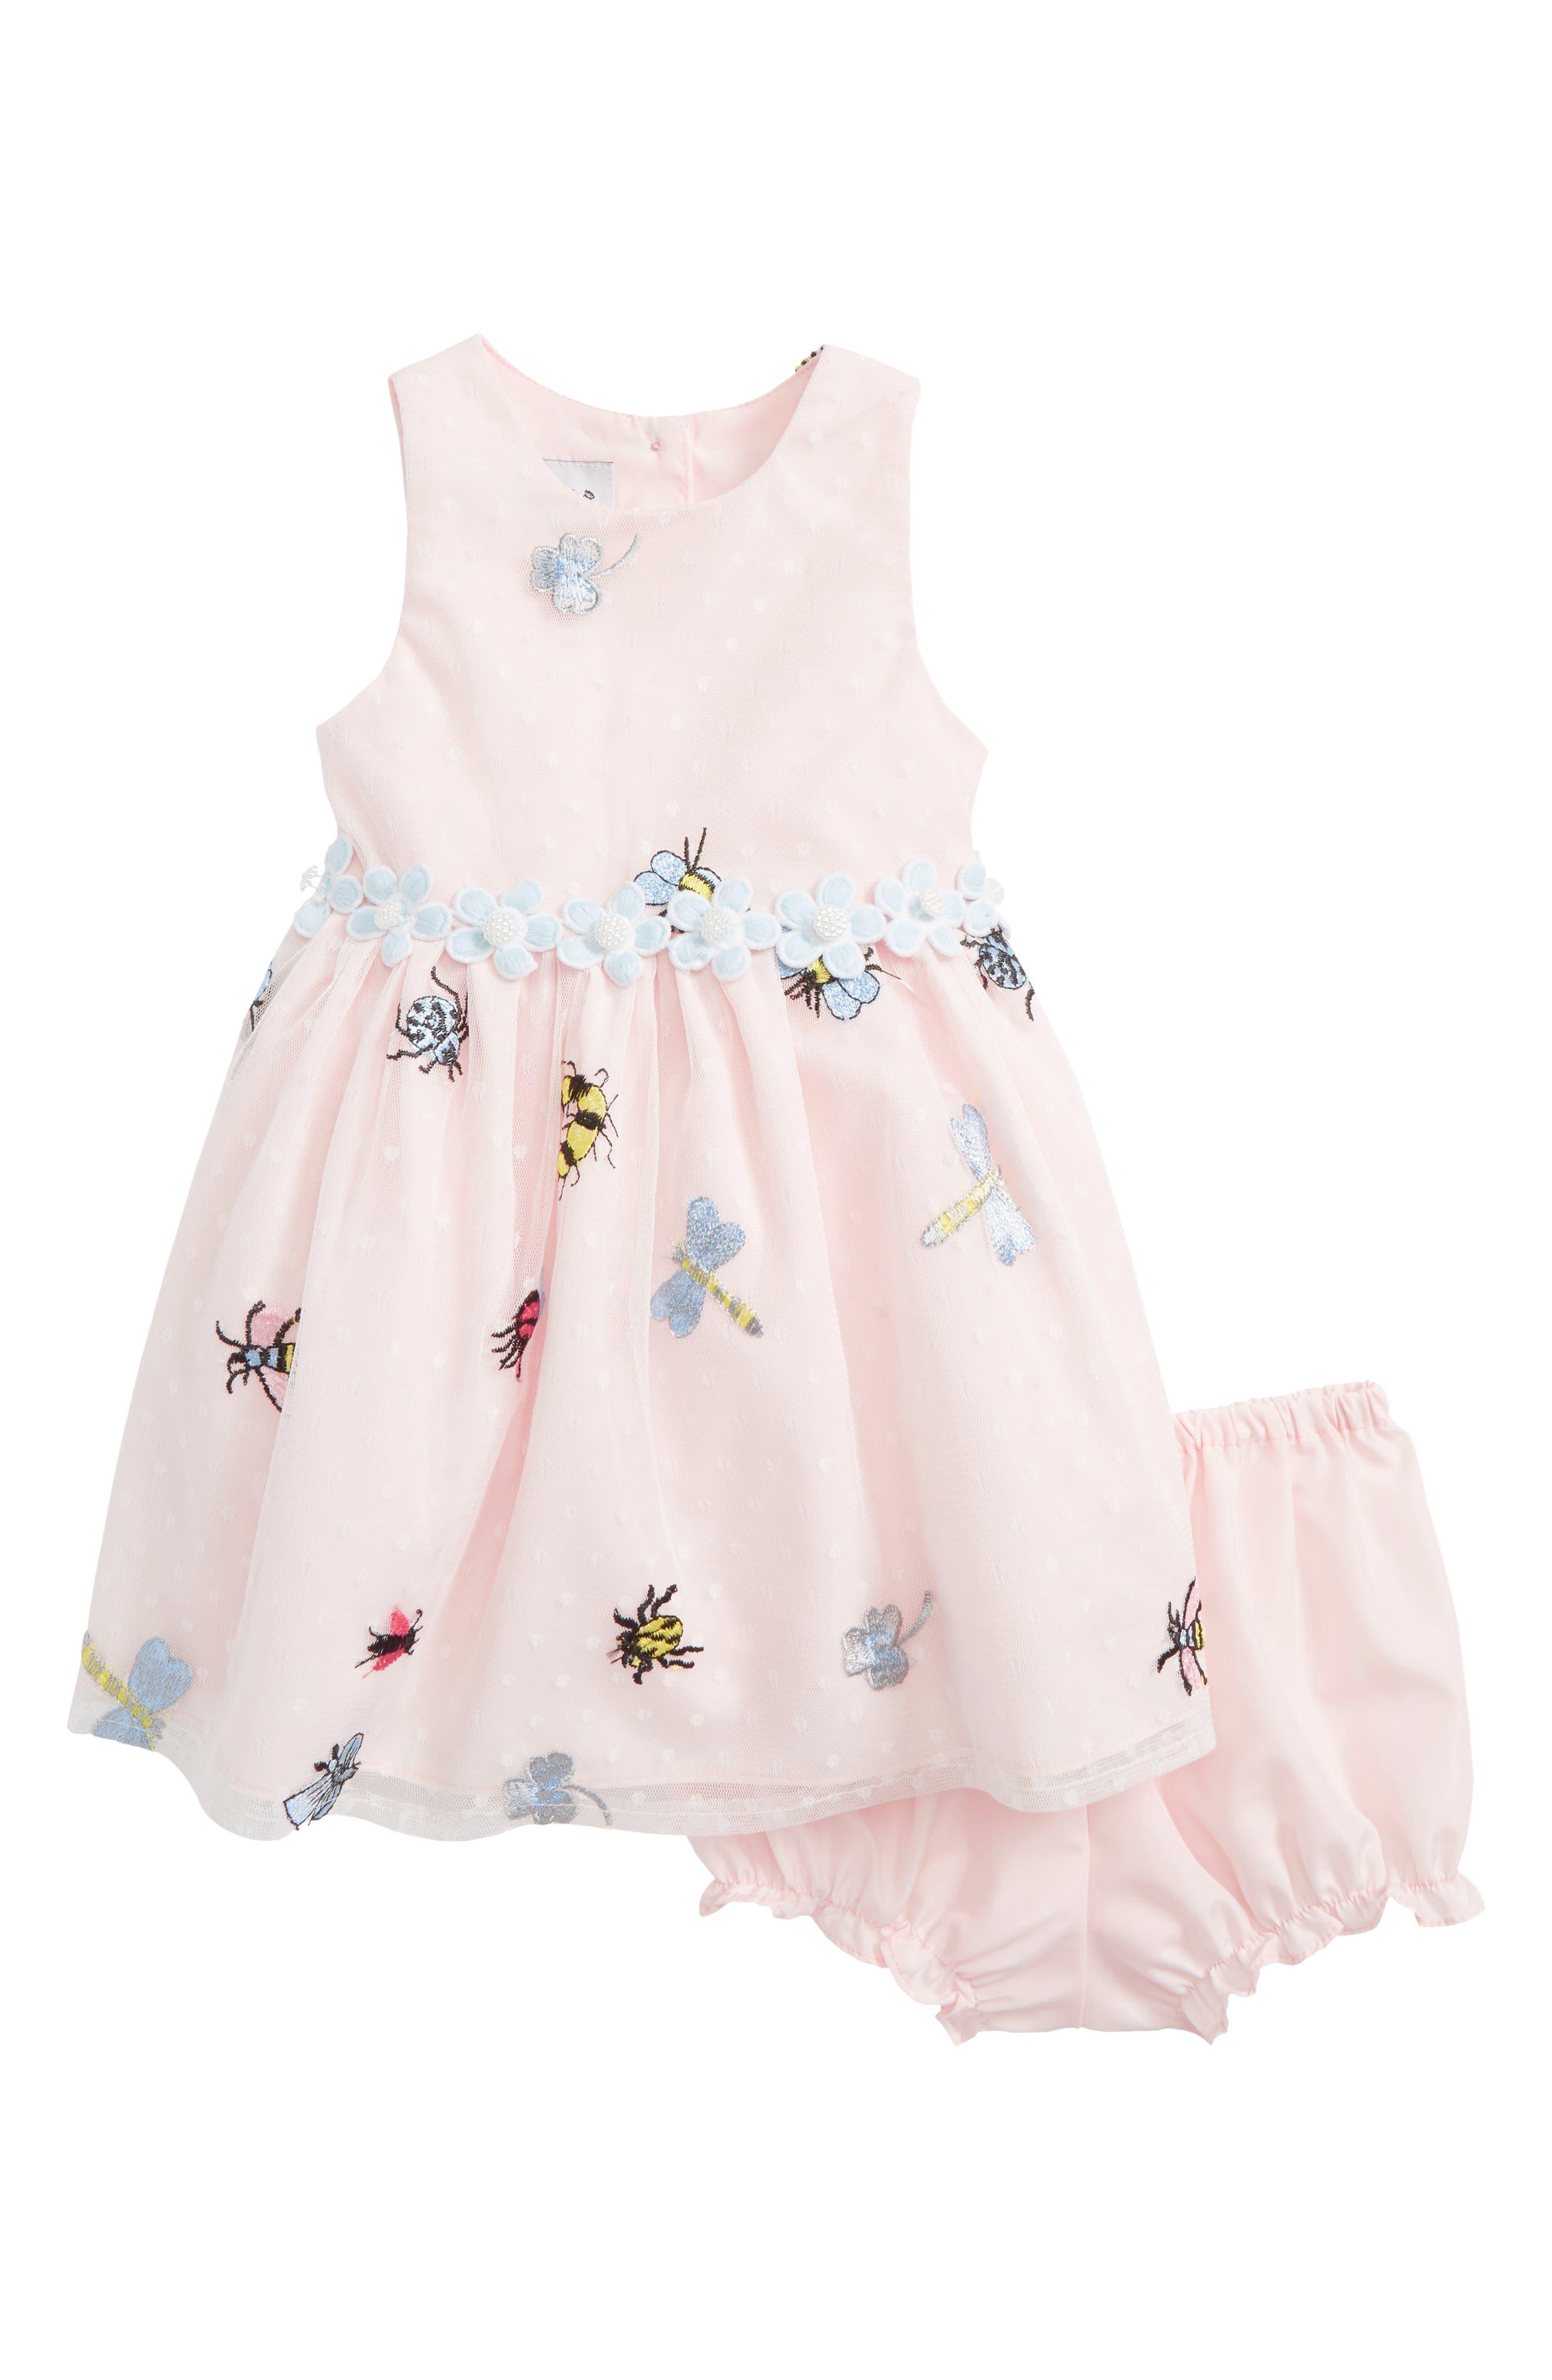 Mesh Bug Dress,                             Main thumbnail 1, color,                             650